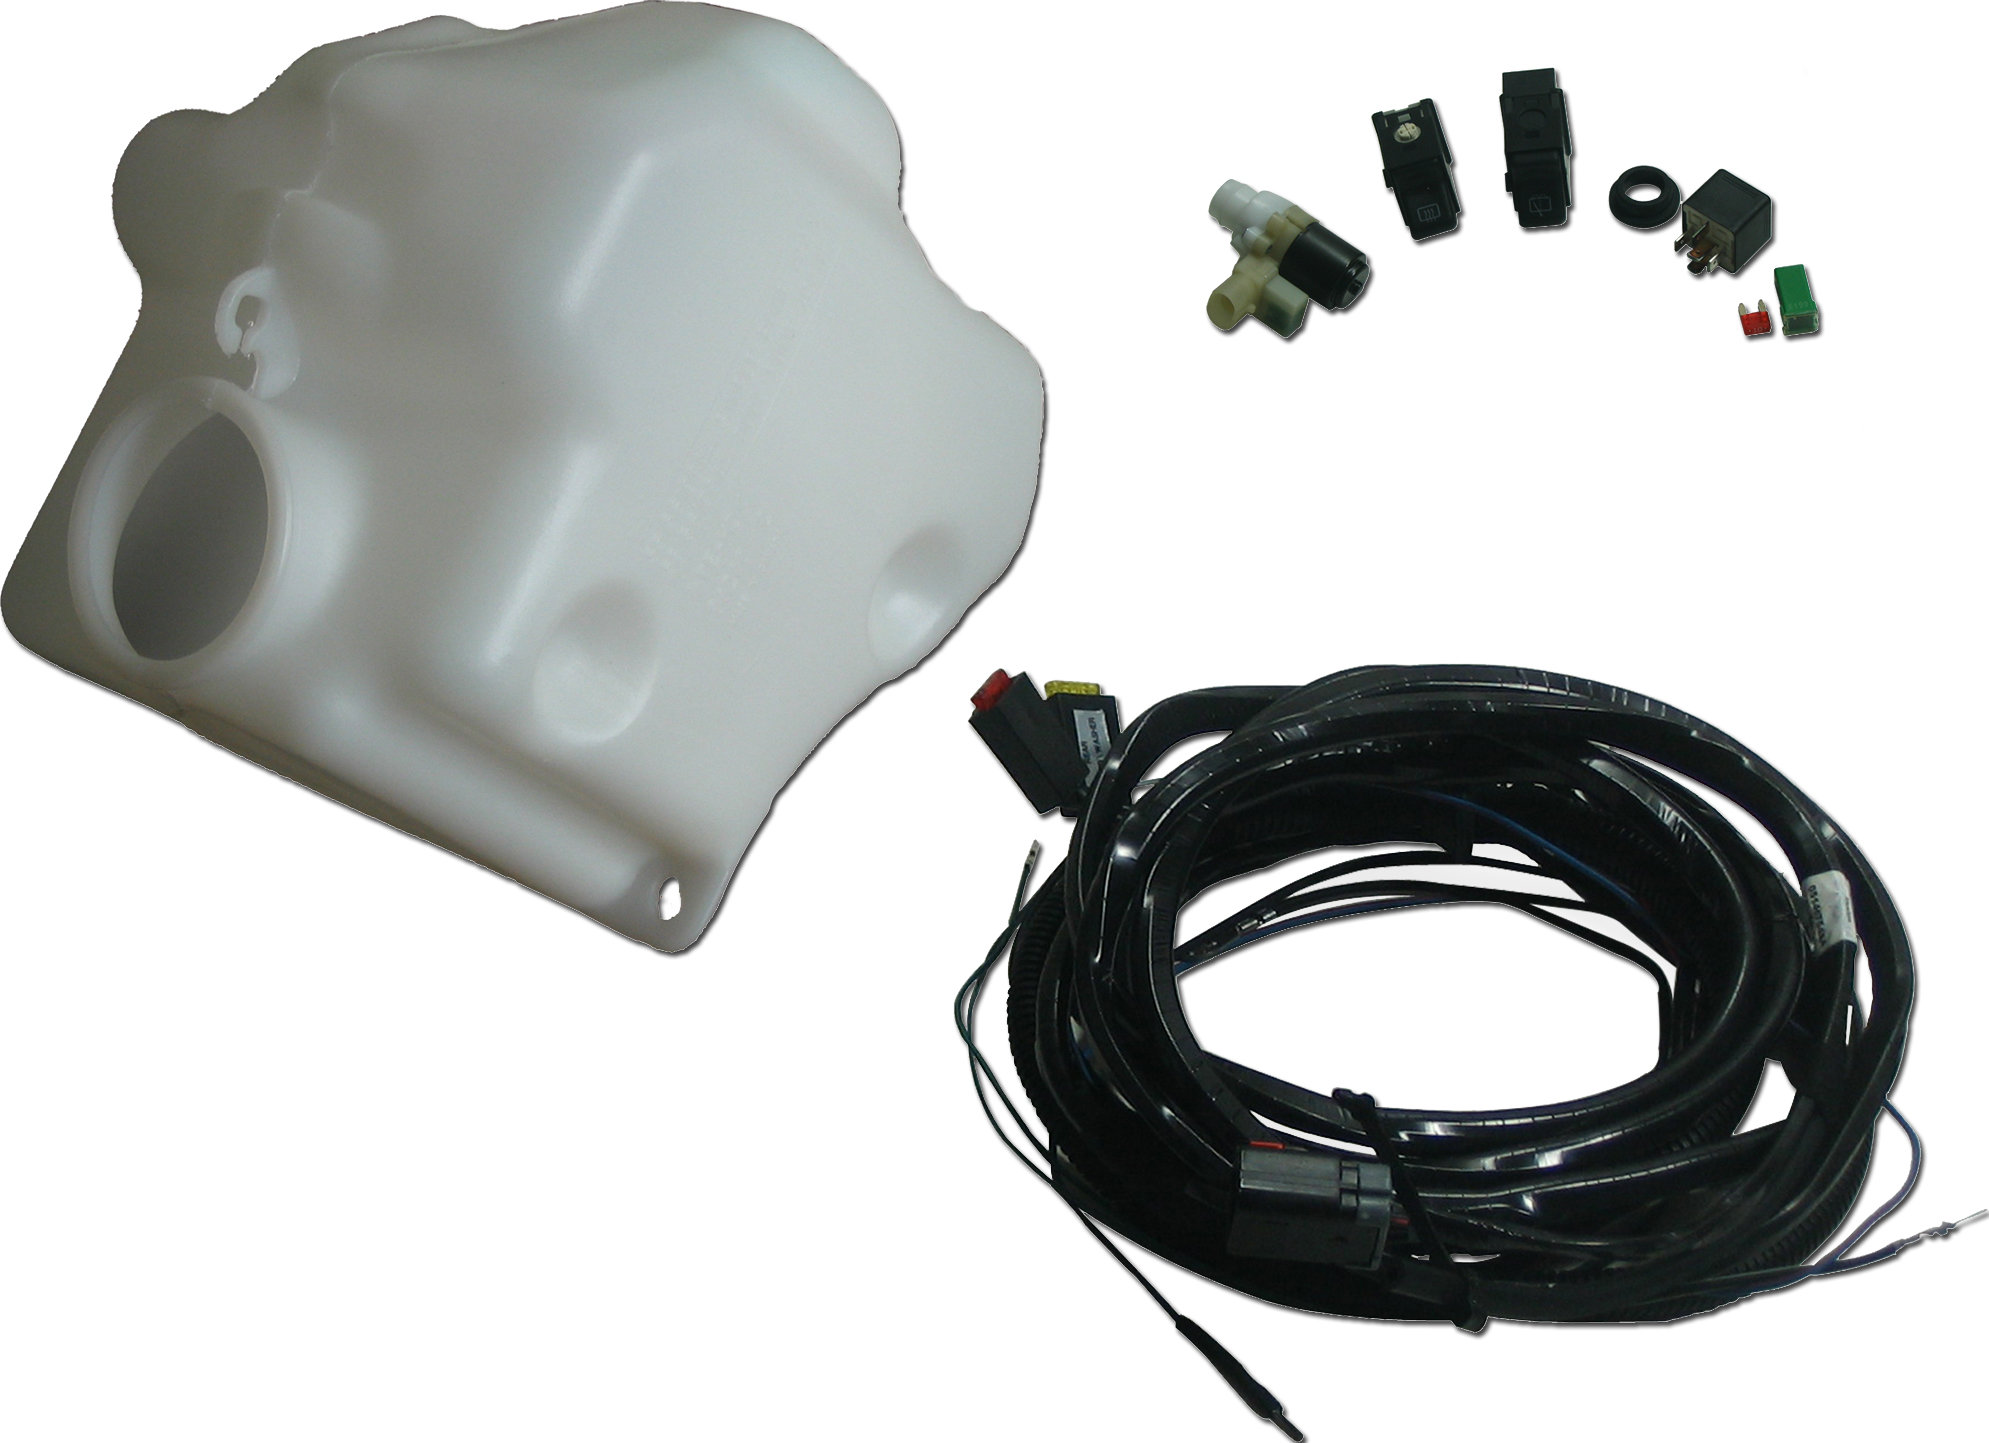 1998 jeep wrangler tj wiring diagram leviton 3 way dimmer switch mopar 82208907ab hardtop kit for 03 06